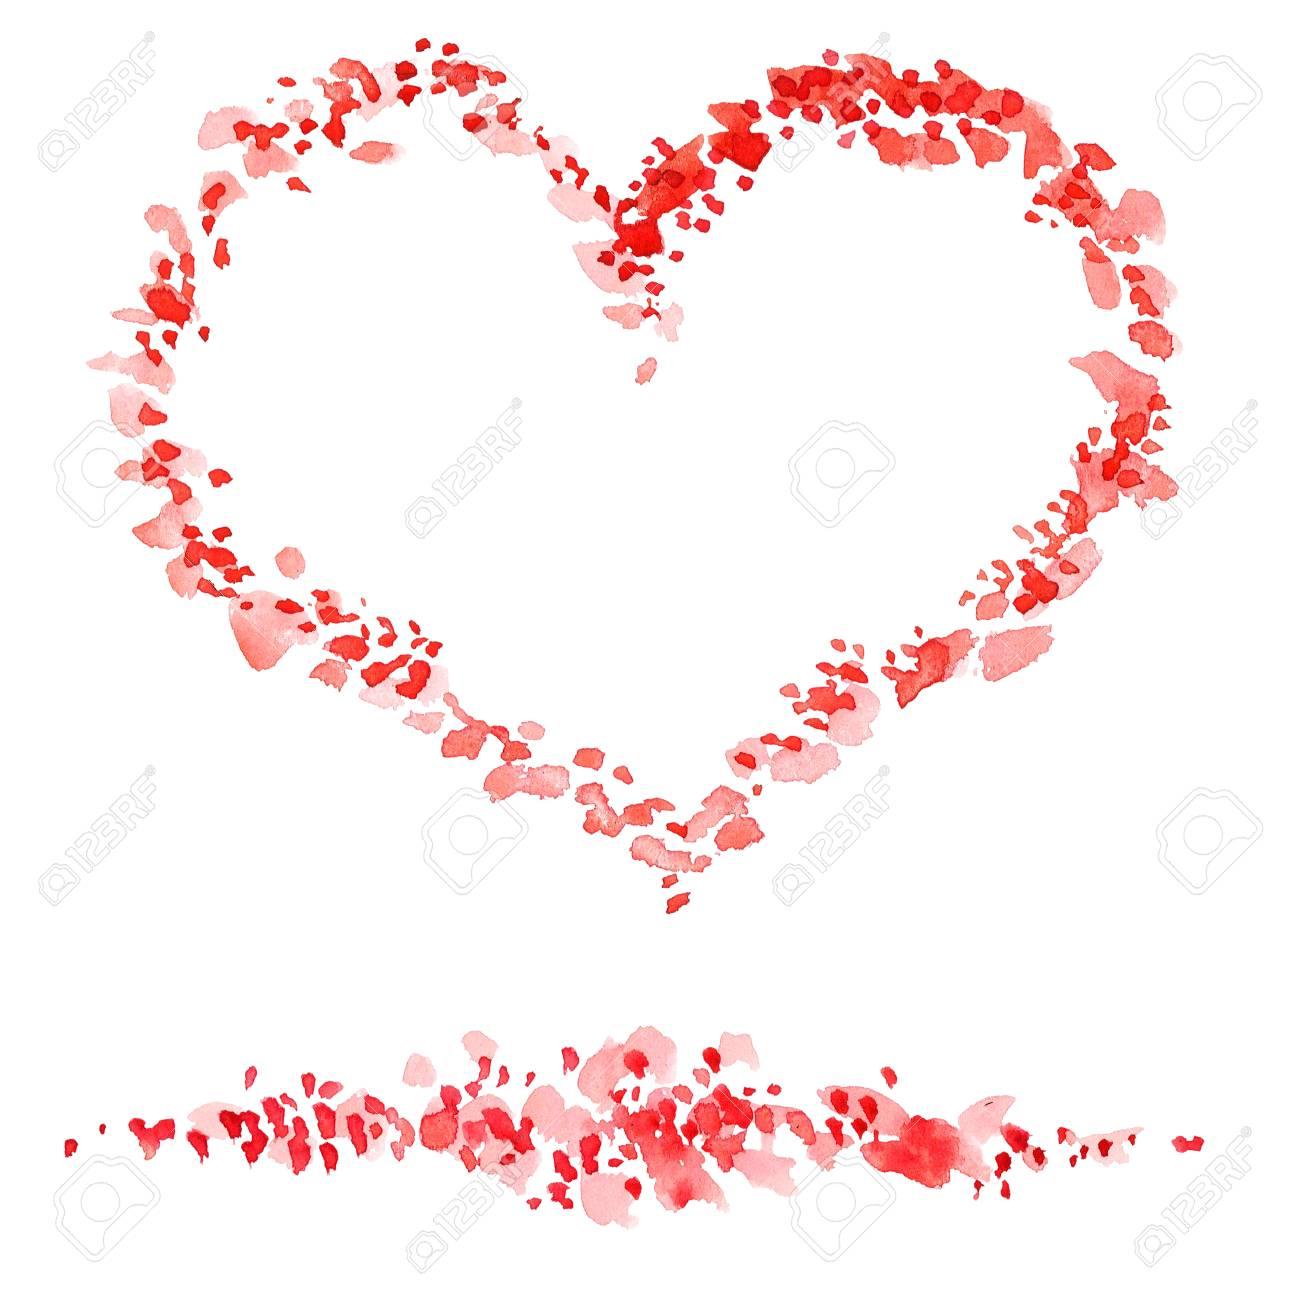 Aquarell Gemalt Dekorative Abbildung Des Herzens Fur Romantische